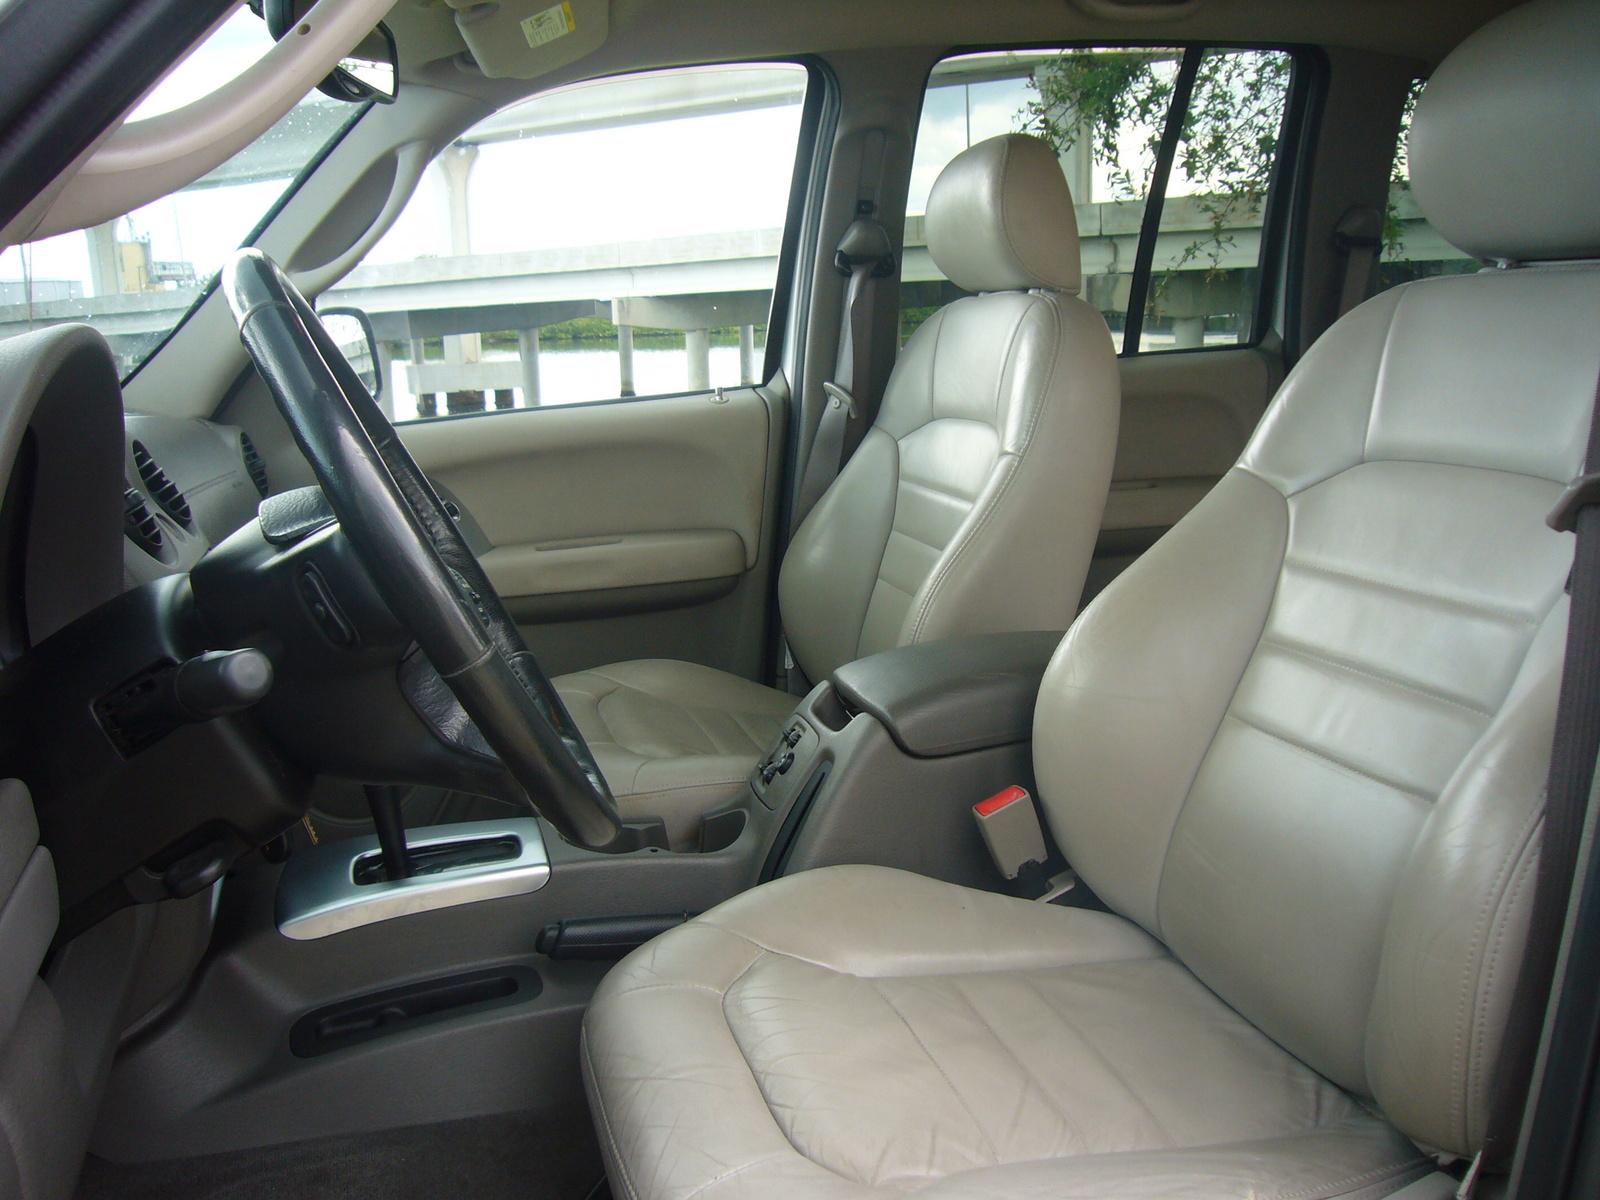 2004 Jeep Liberty Interior Pictures Cargurus